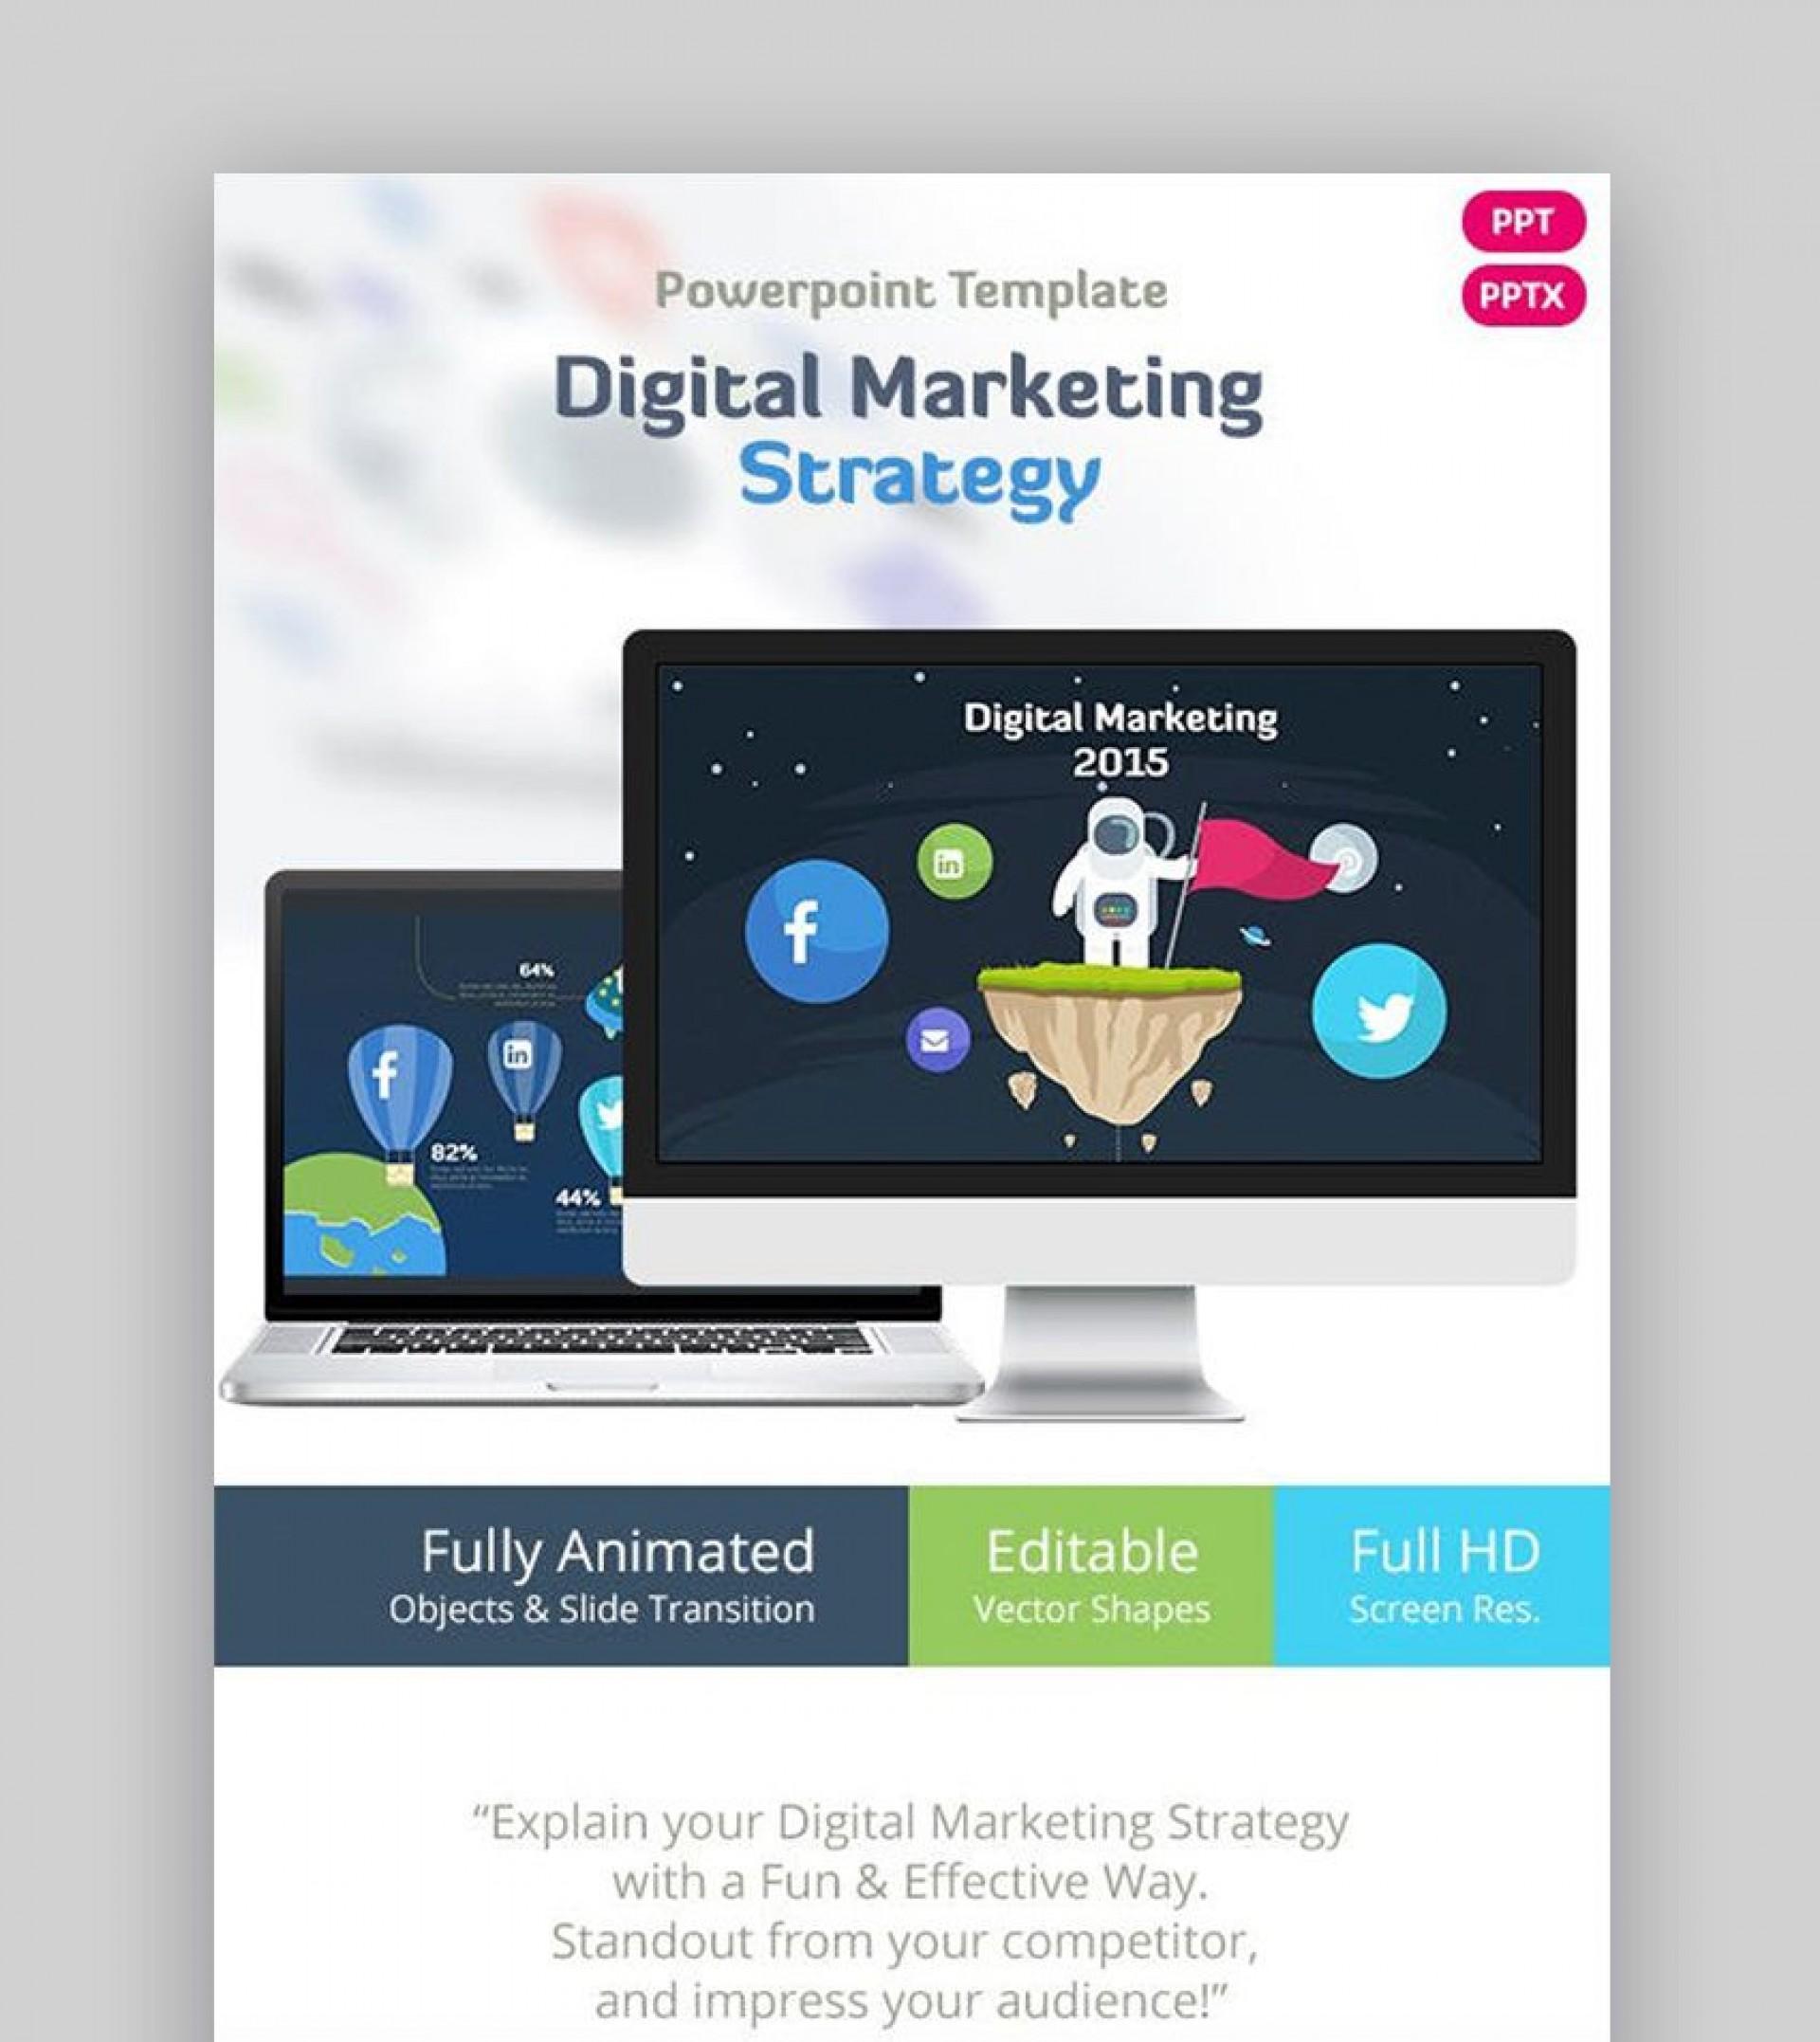 010 Stunning Digital Marketing Plan Example Ppt 1920